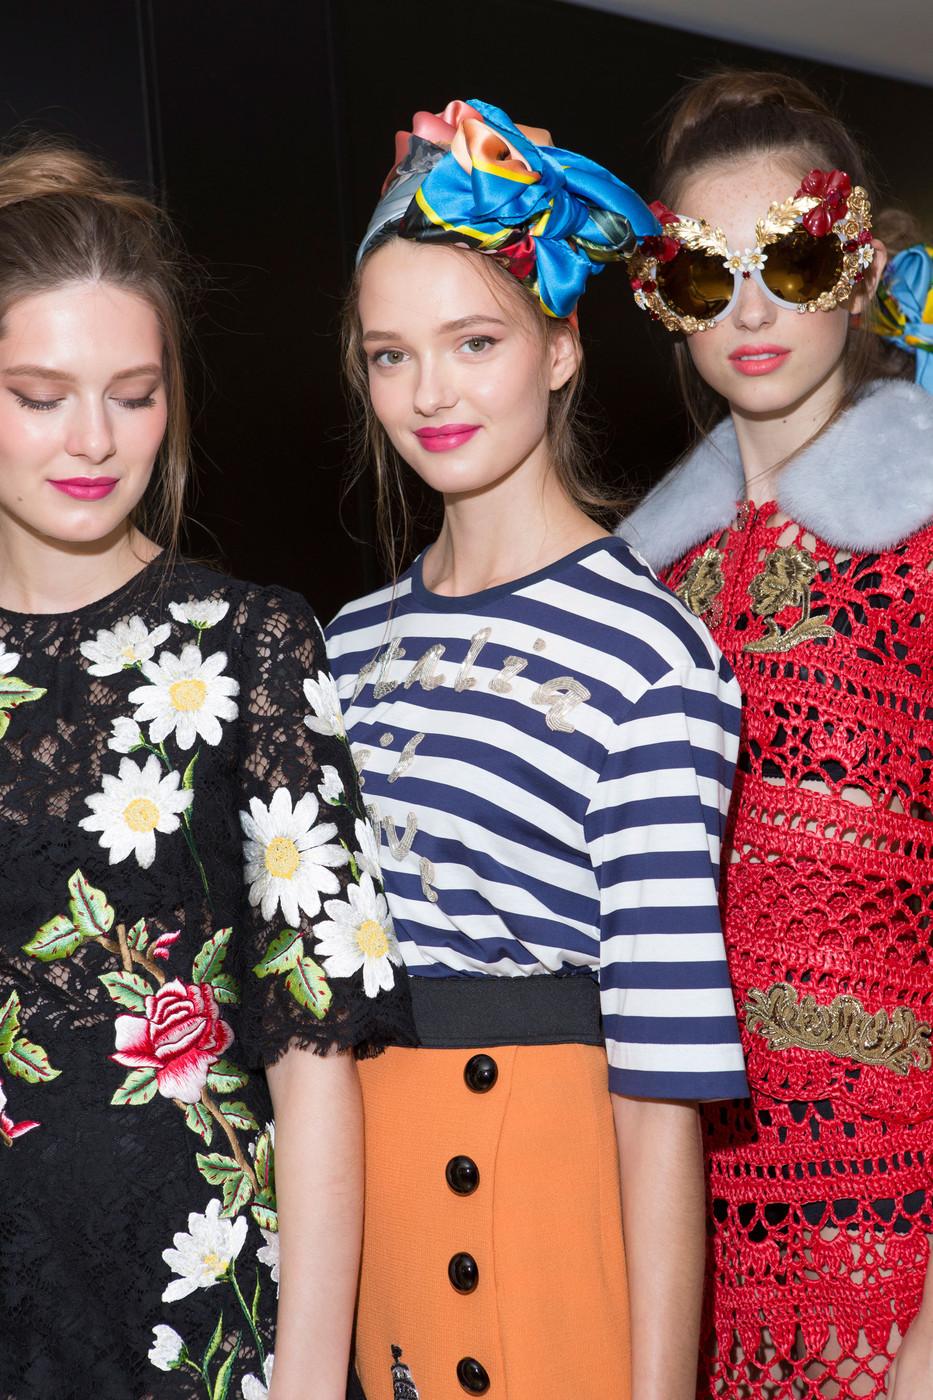 Dolce+Gabbana+Spring+2016+Backstage+enyeGaJWAEBx.jpg